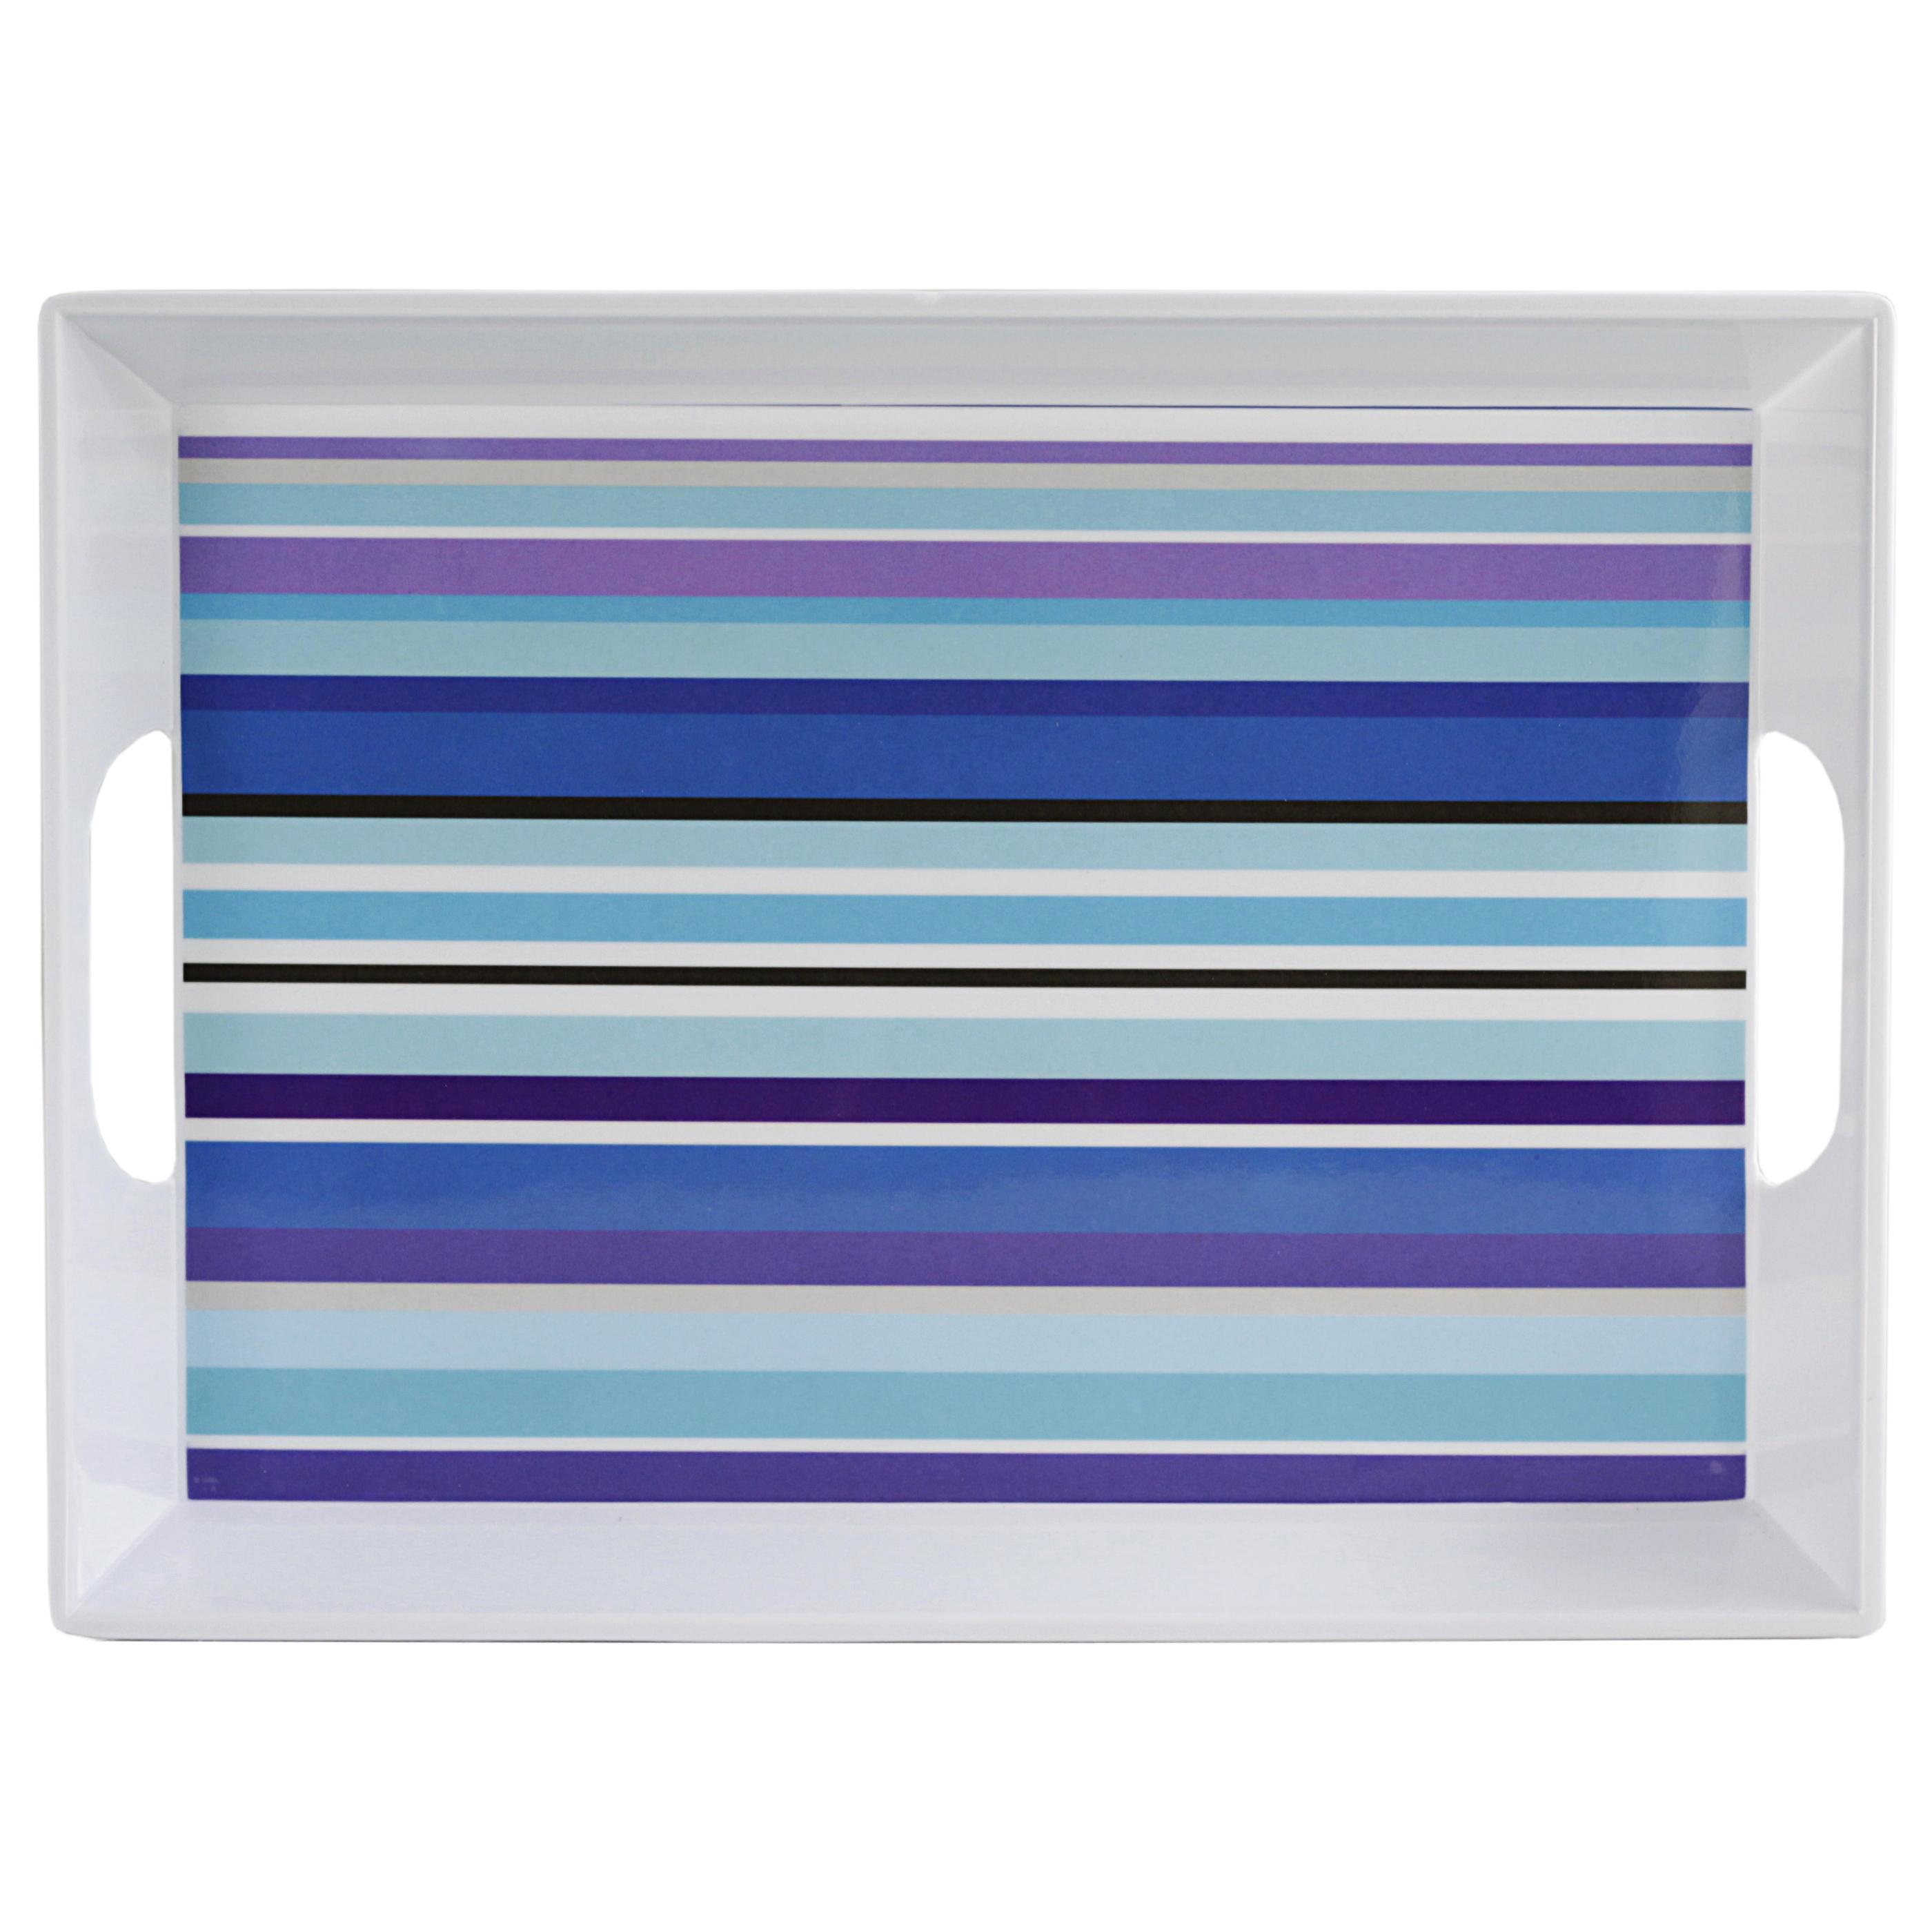 Typhoon Colored Stripes 16 x 11.75 Inch Breakfast Tray